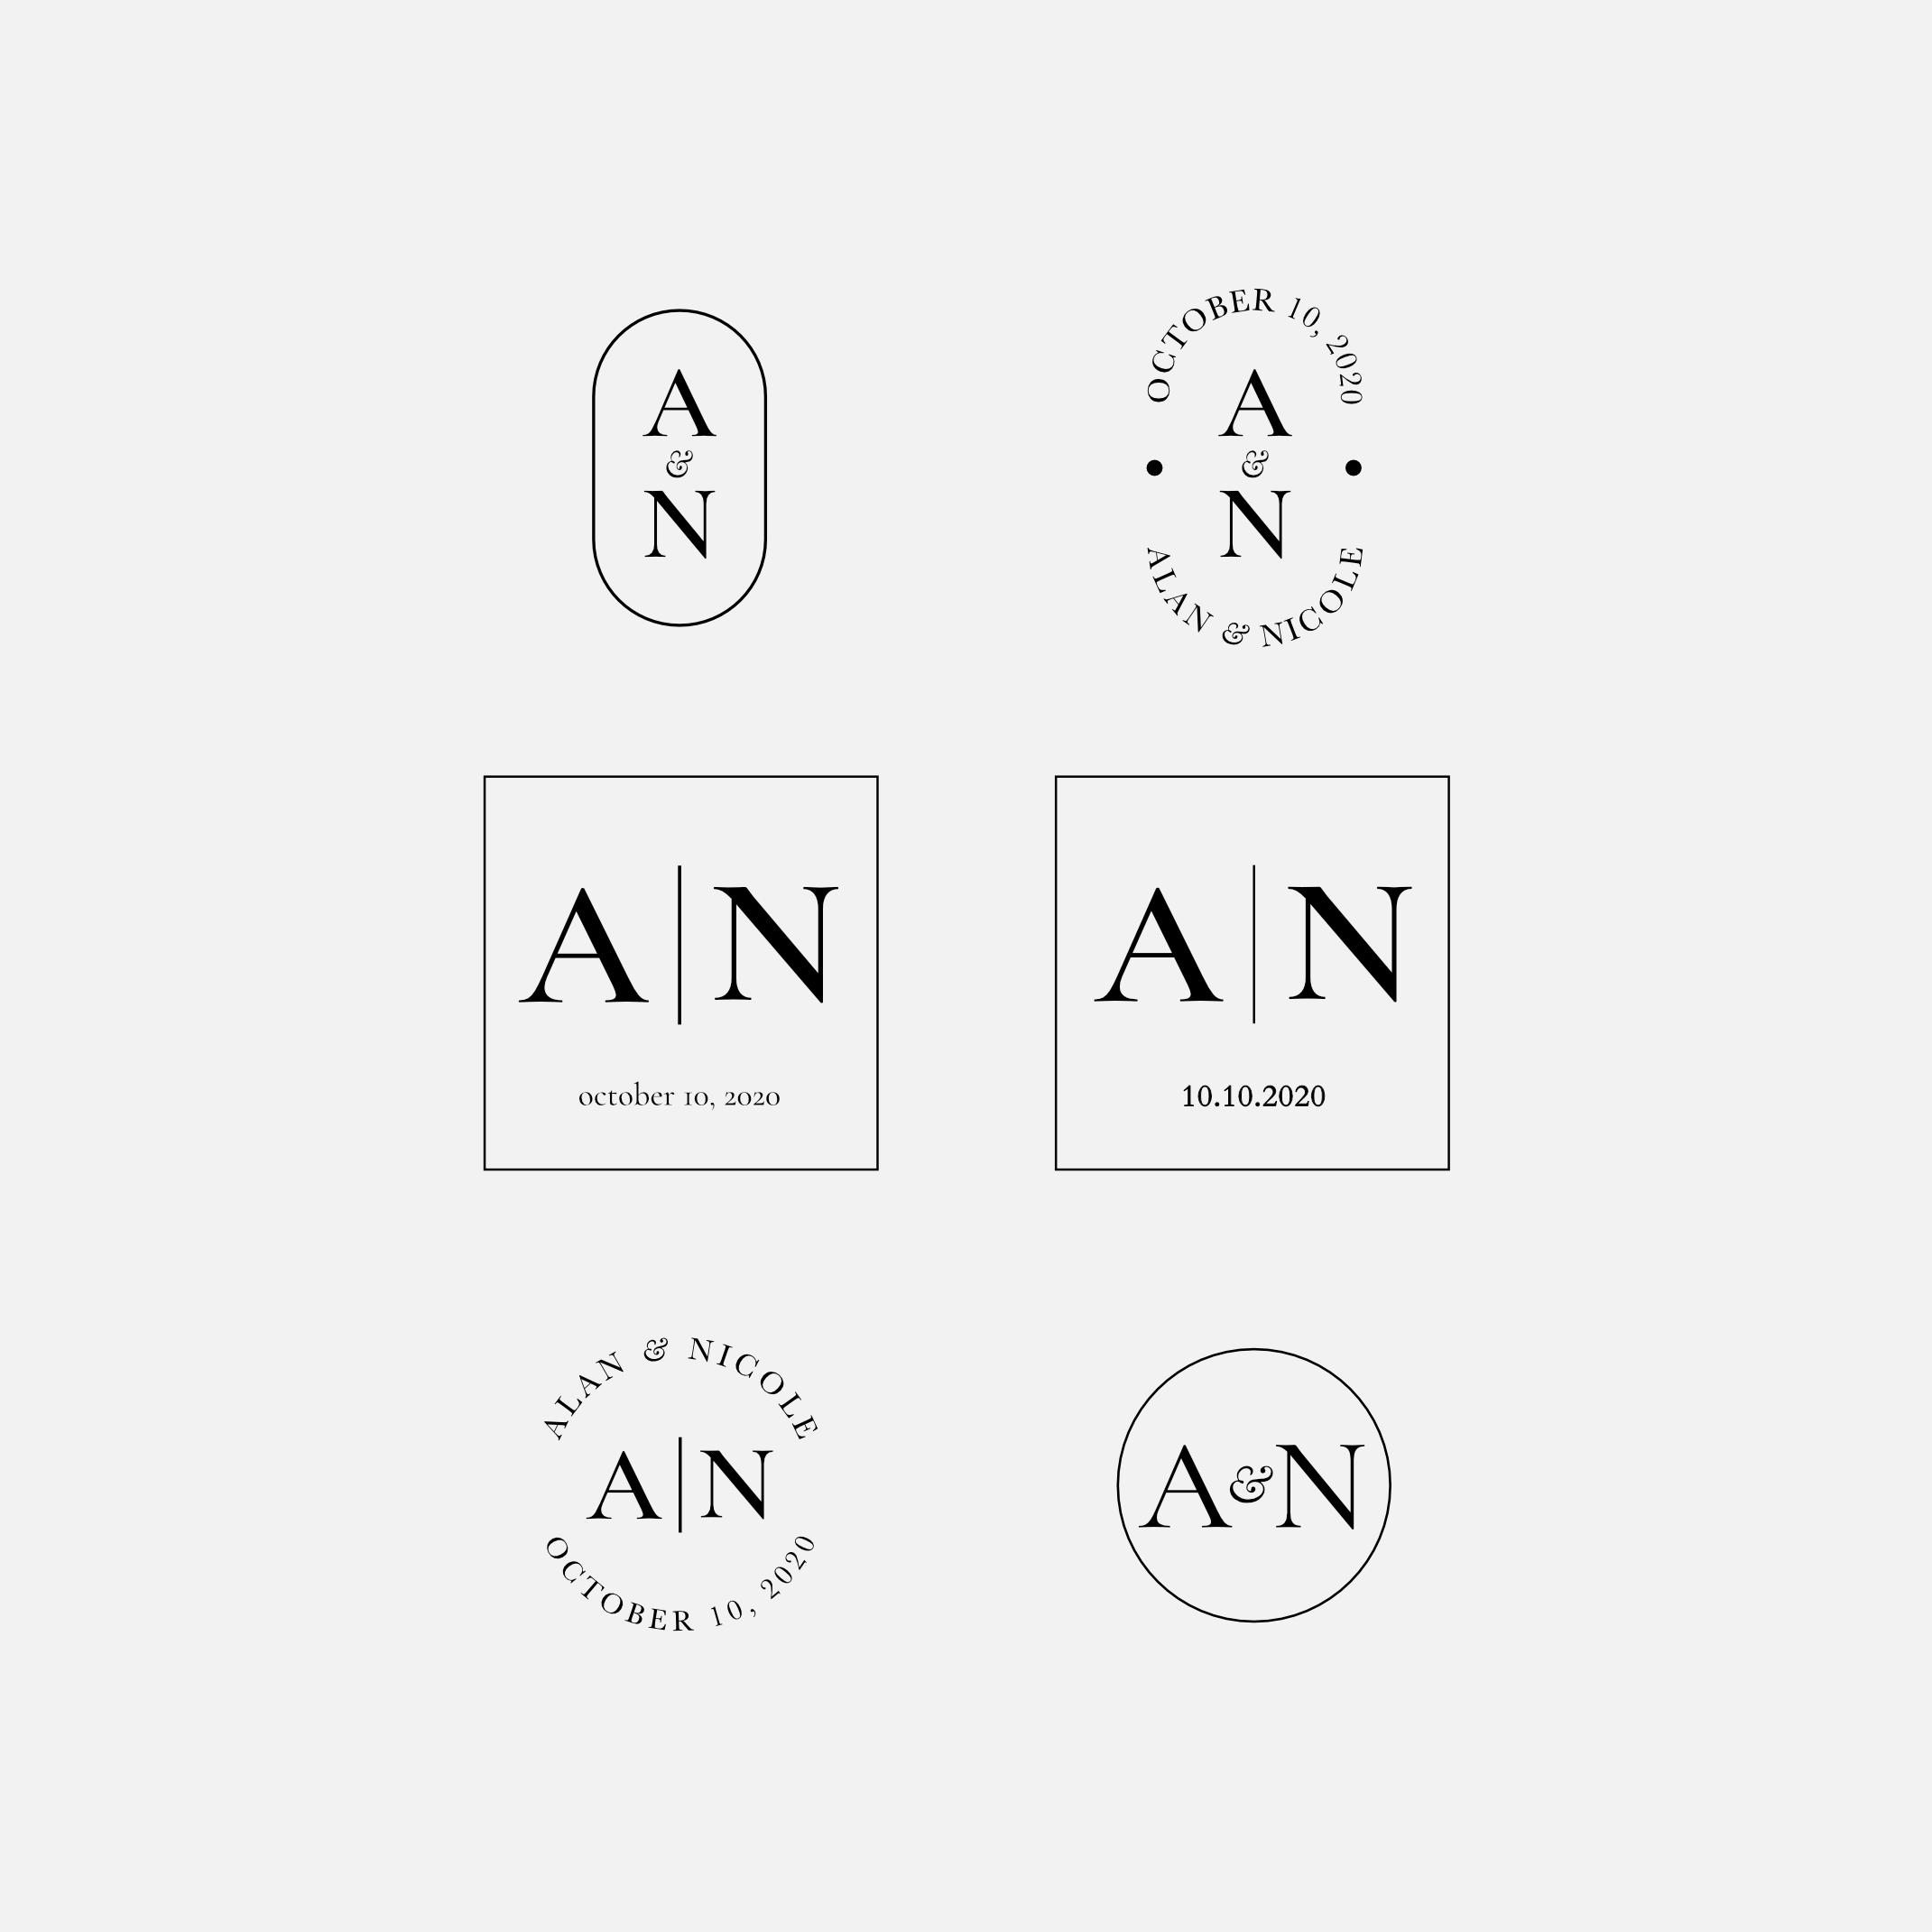 alannicole-igsquare.png